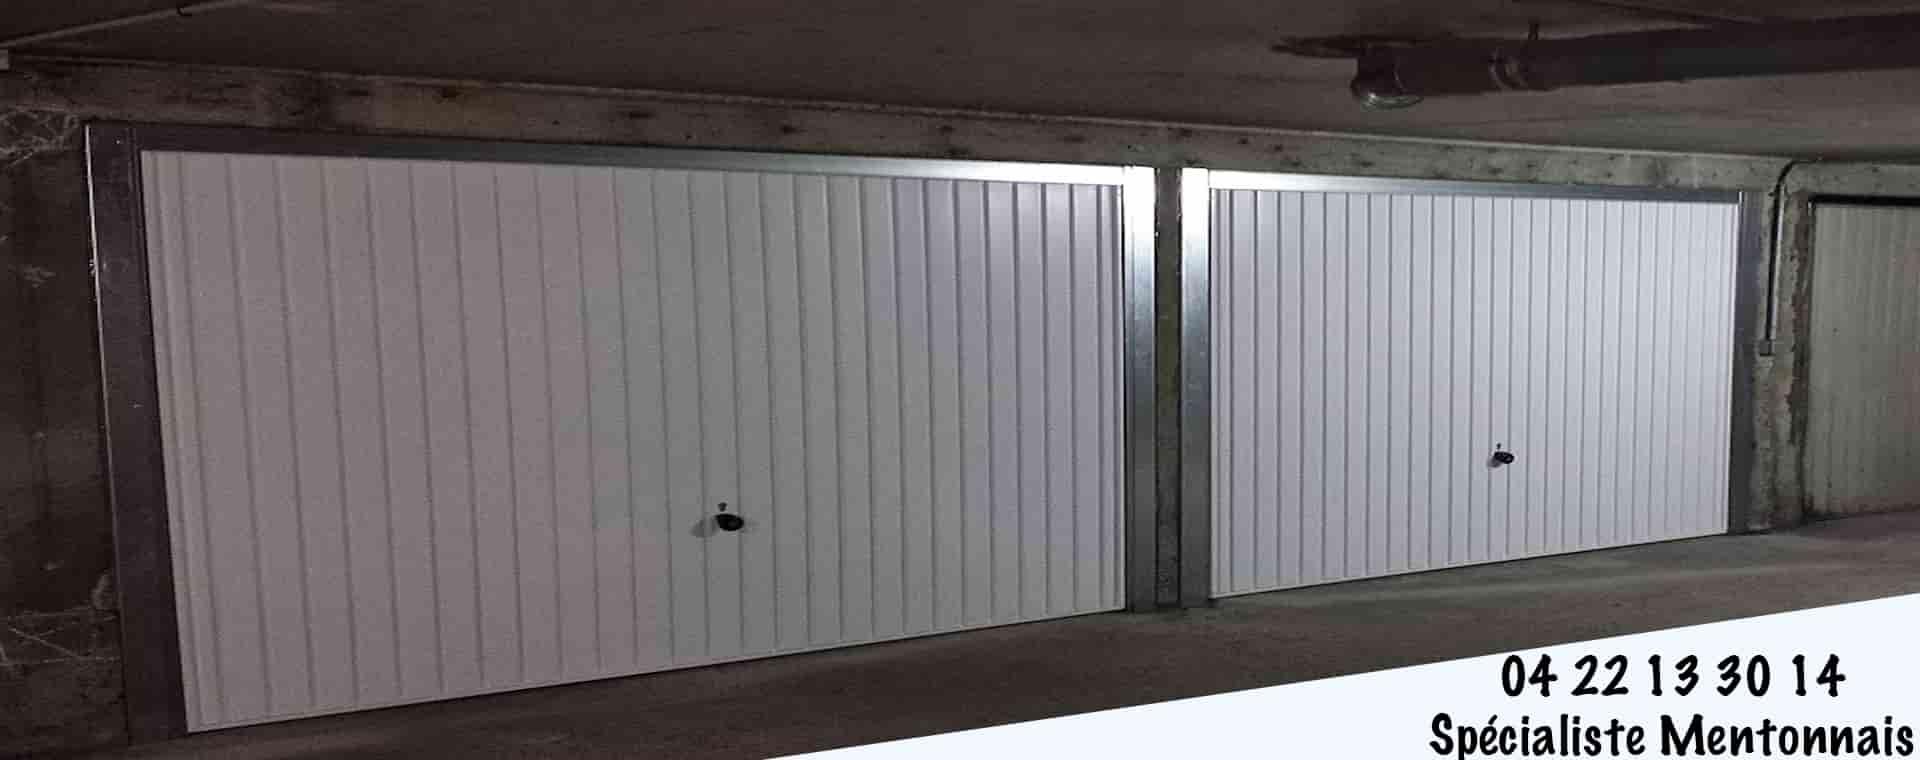 ouverture porte de garage a Menton, serrurier porte de garage a Menton, serrurier pas cher porte de garage a Menton